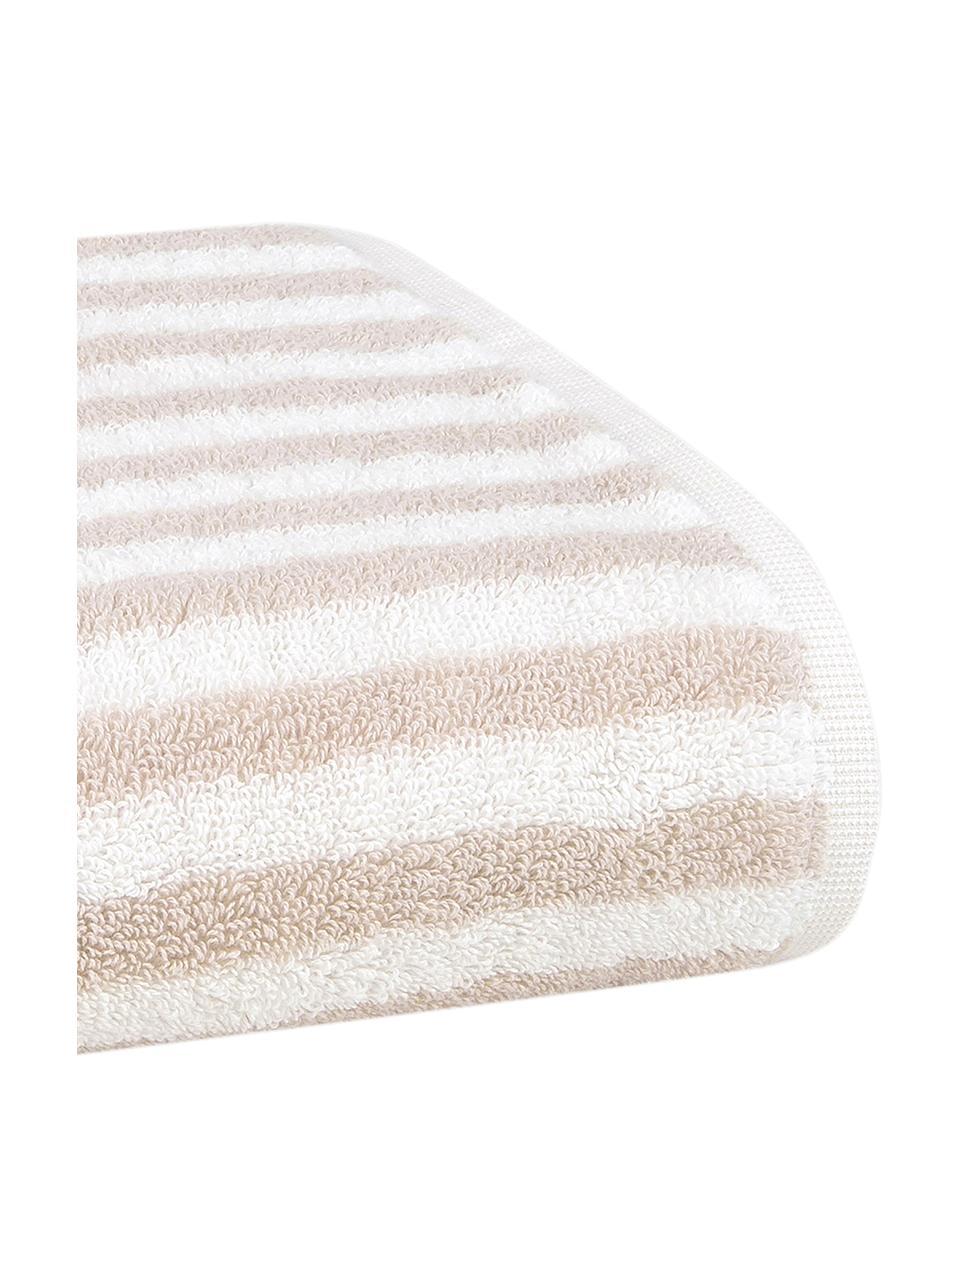 Set 3 asciugamani reversibili Viola, Sabbia, bianco crema, Set in varie misure